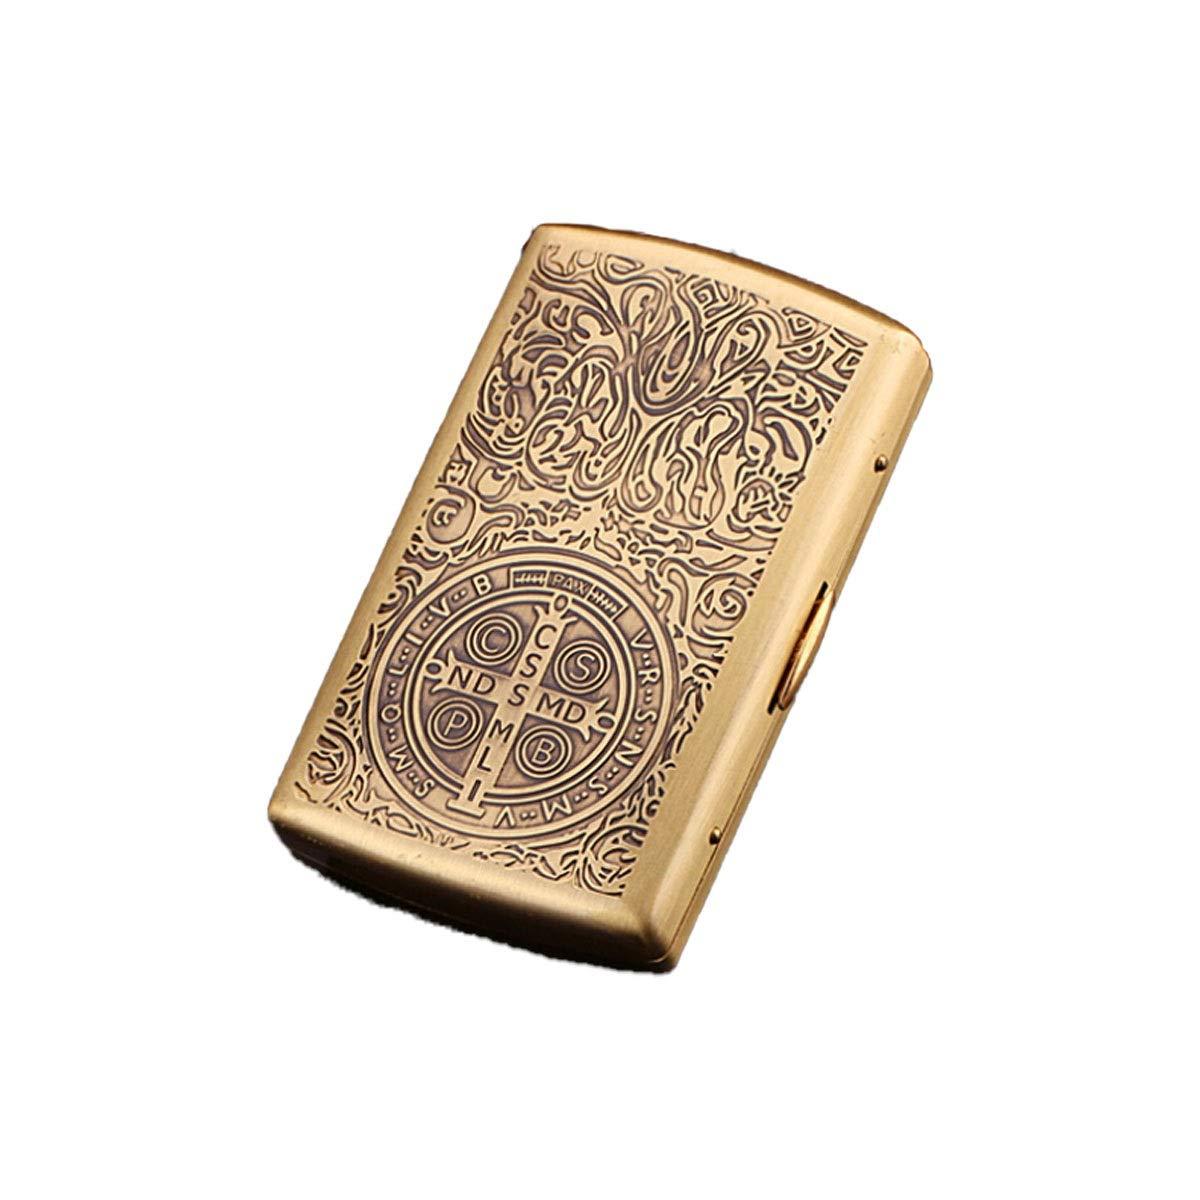 ZHONGYUE Pure Copper Cigarette Case, 12 Capacity, Metal Cigarette Case, Creative Personality Men's Cigarette Case Unique Design, Sturdy and Lightweight. (Color : Gold)